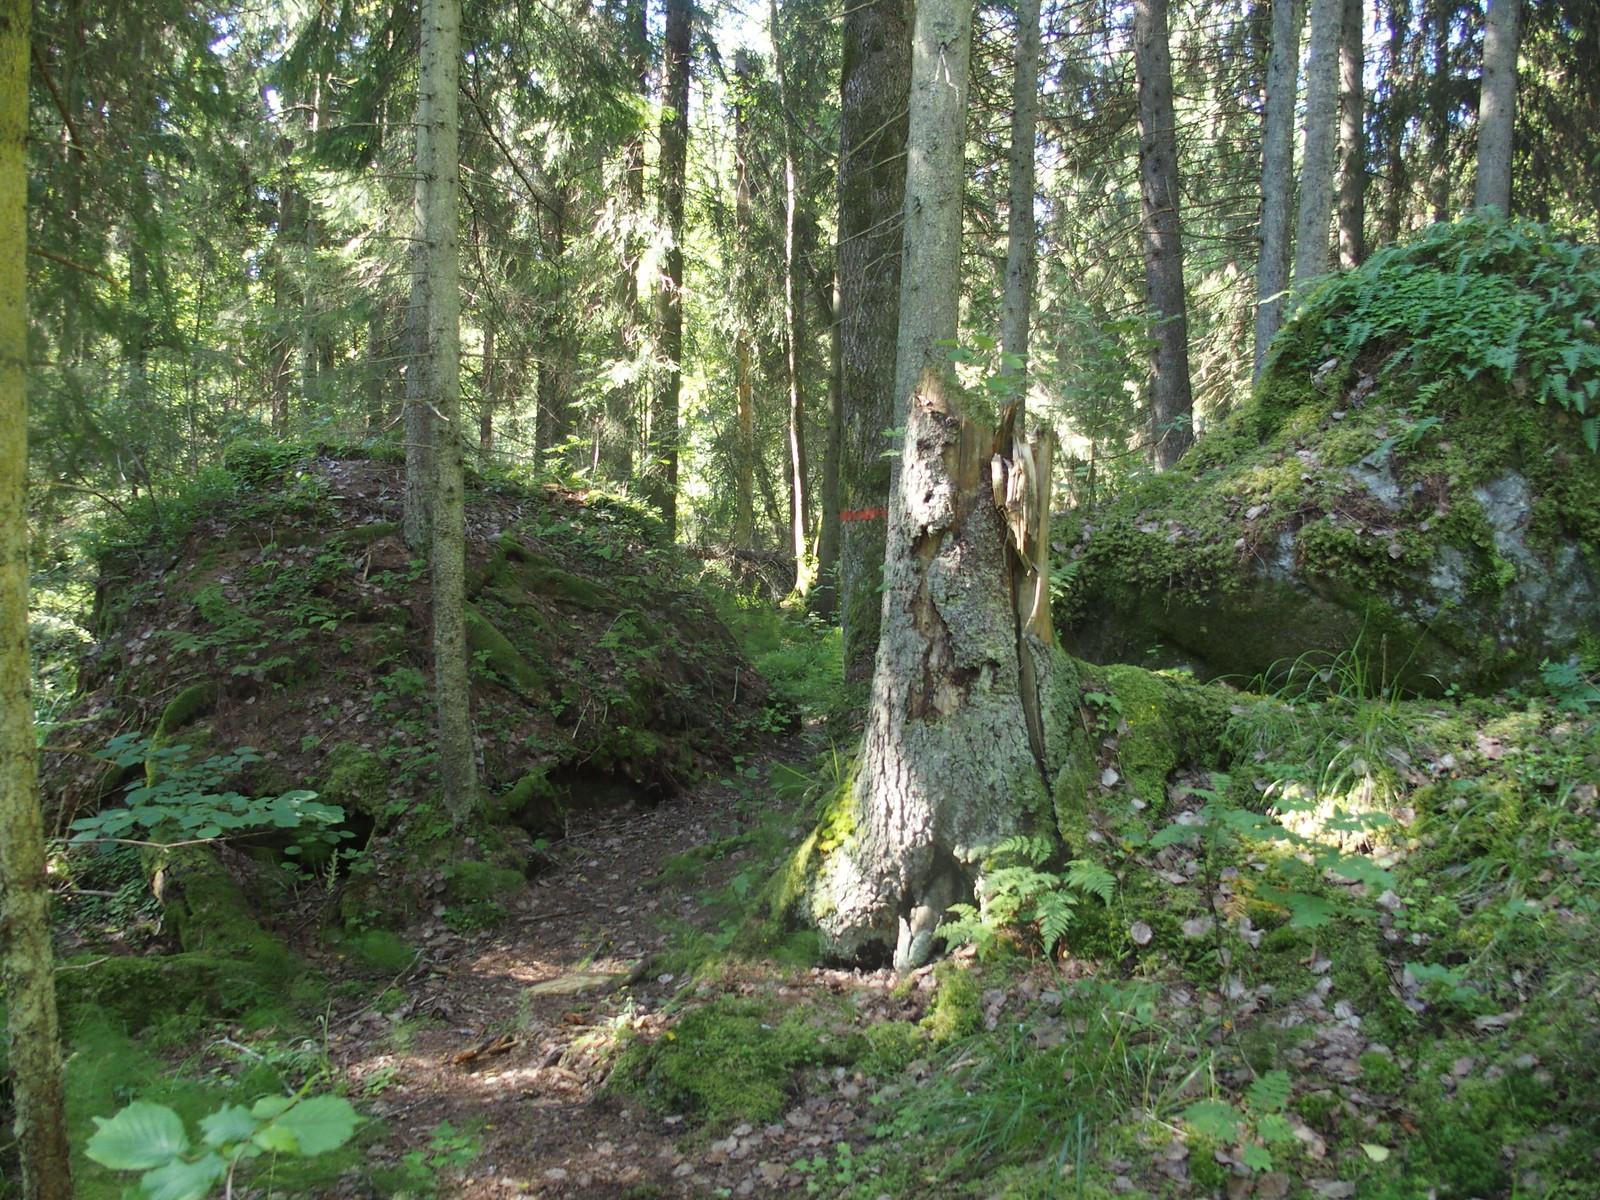 SÖ E5.1 Vresig skog